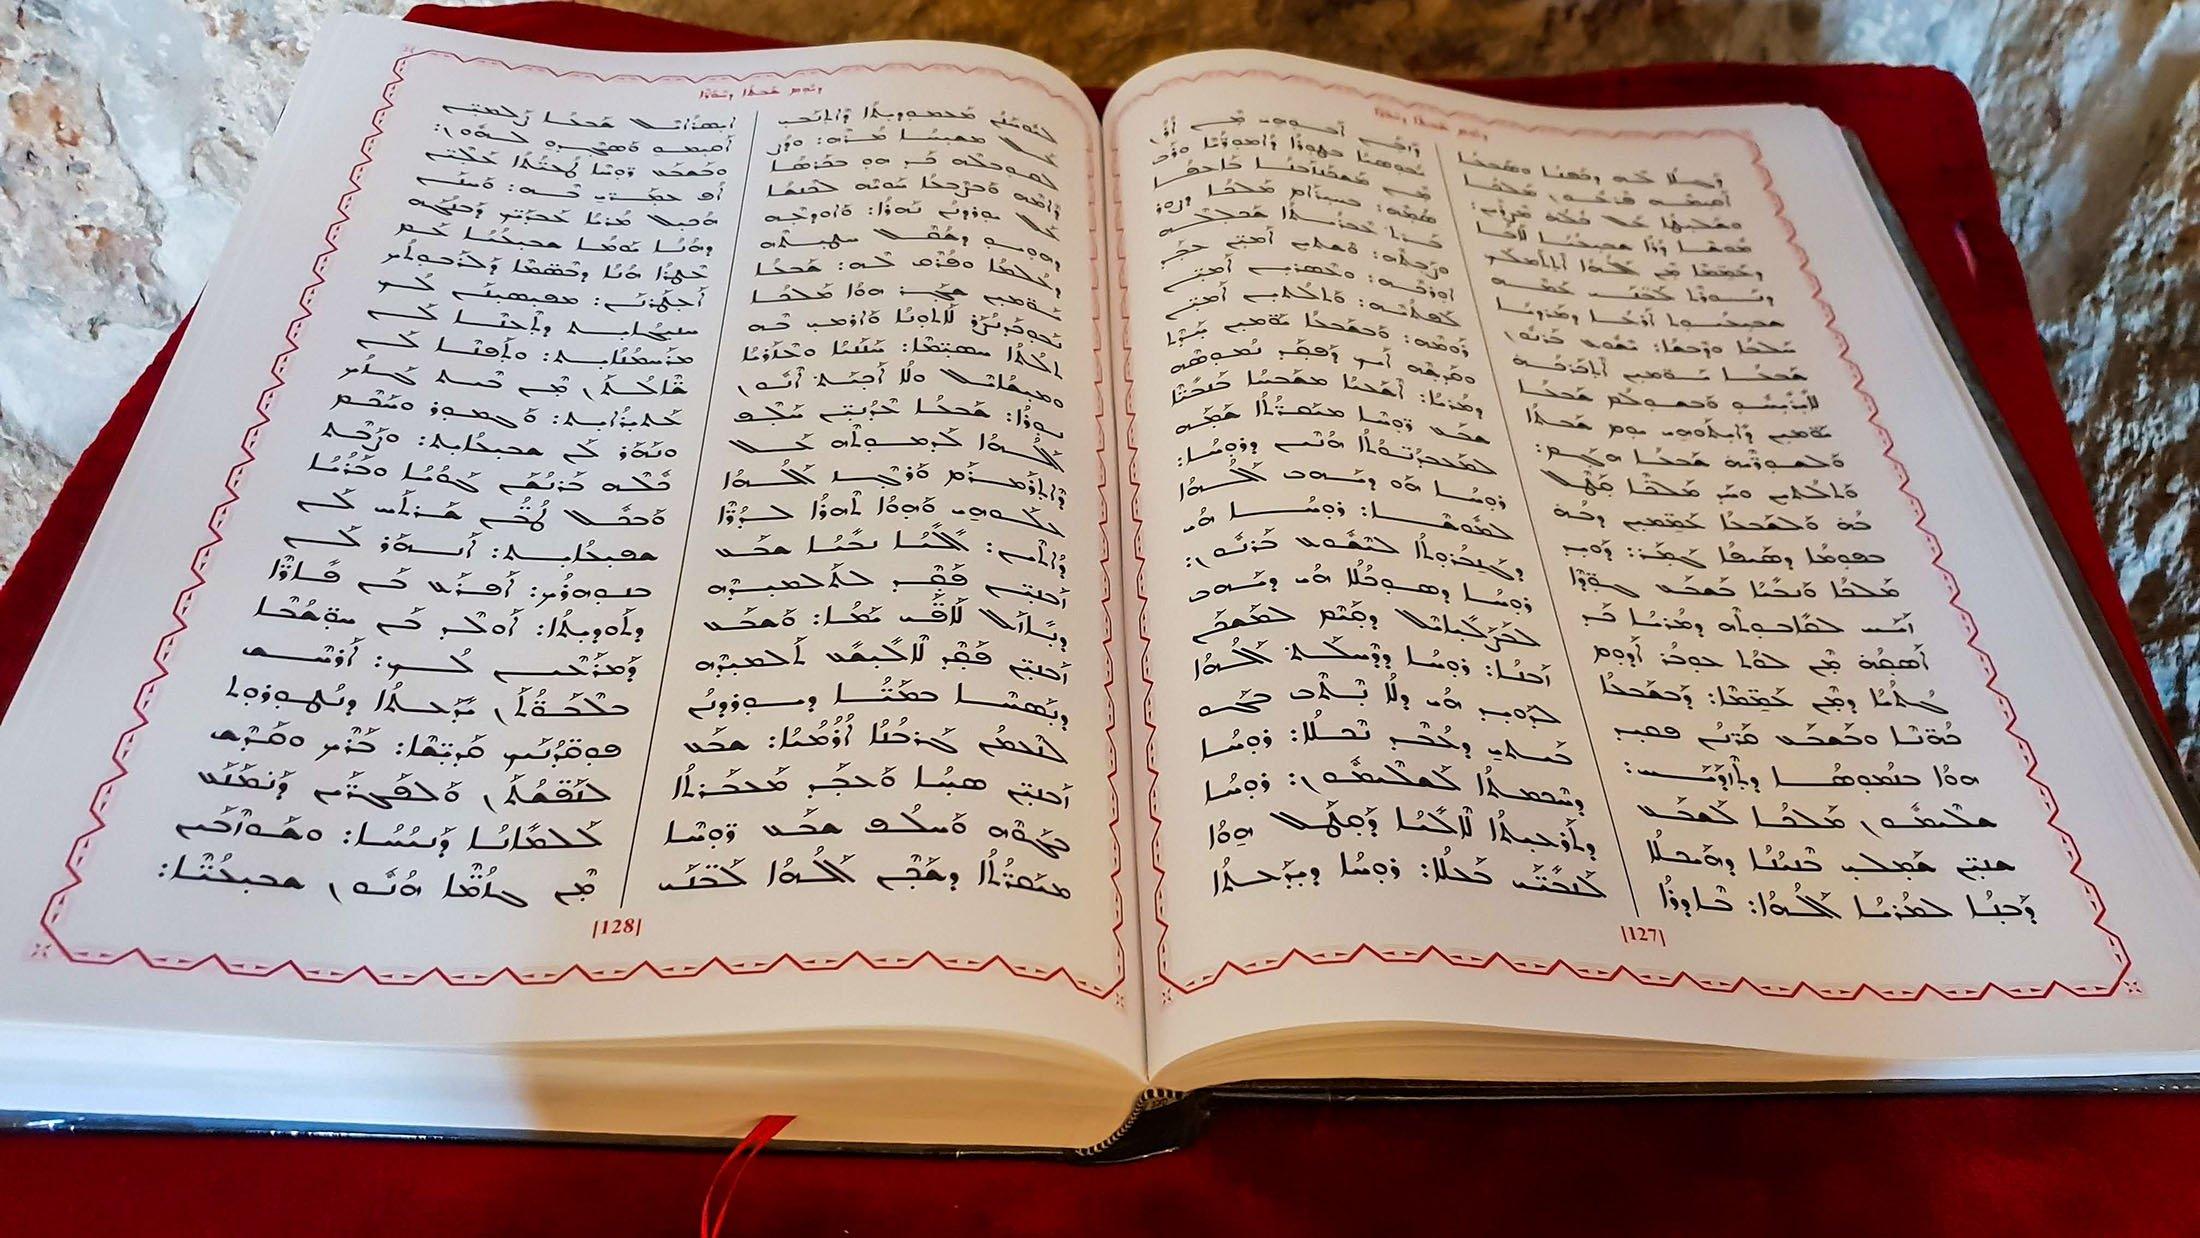 An old Bible in the Mor Gabriel Monastery. (Photo by Argun Konuk)